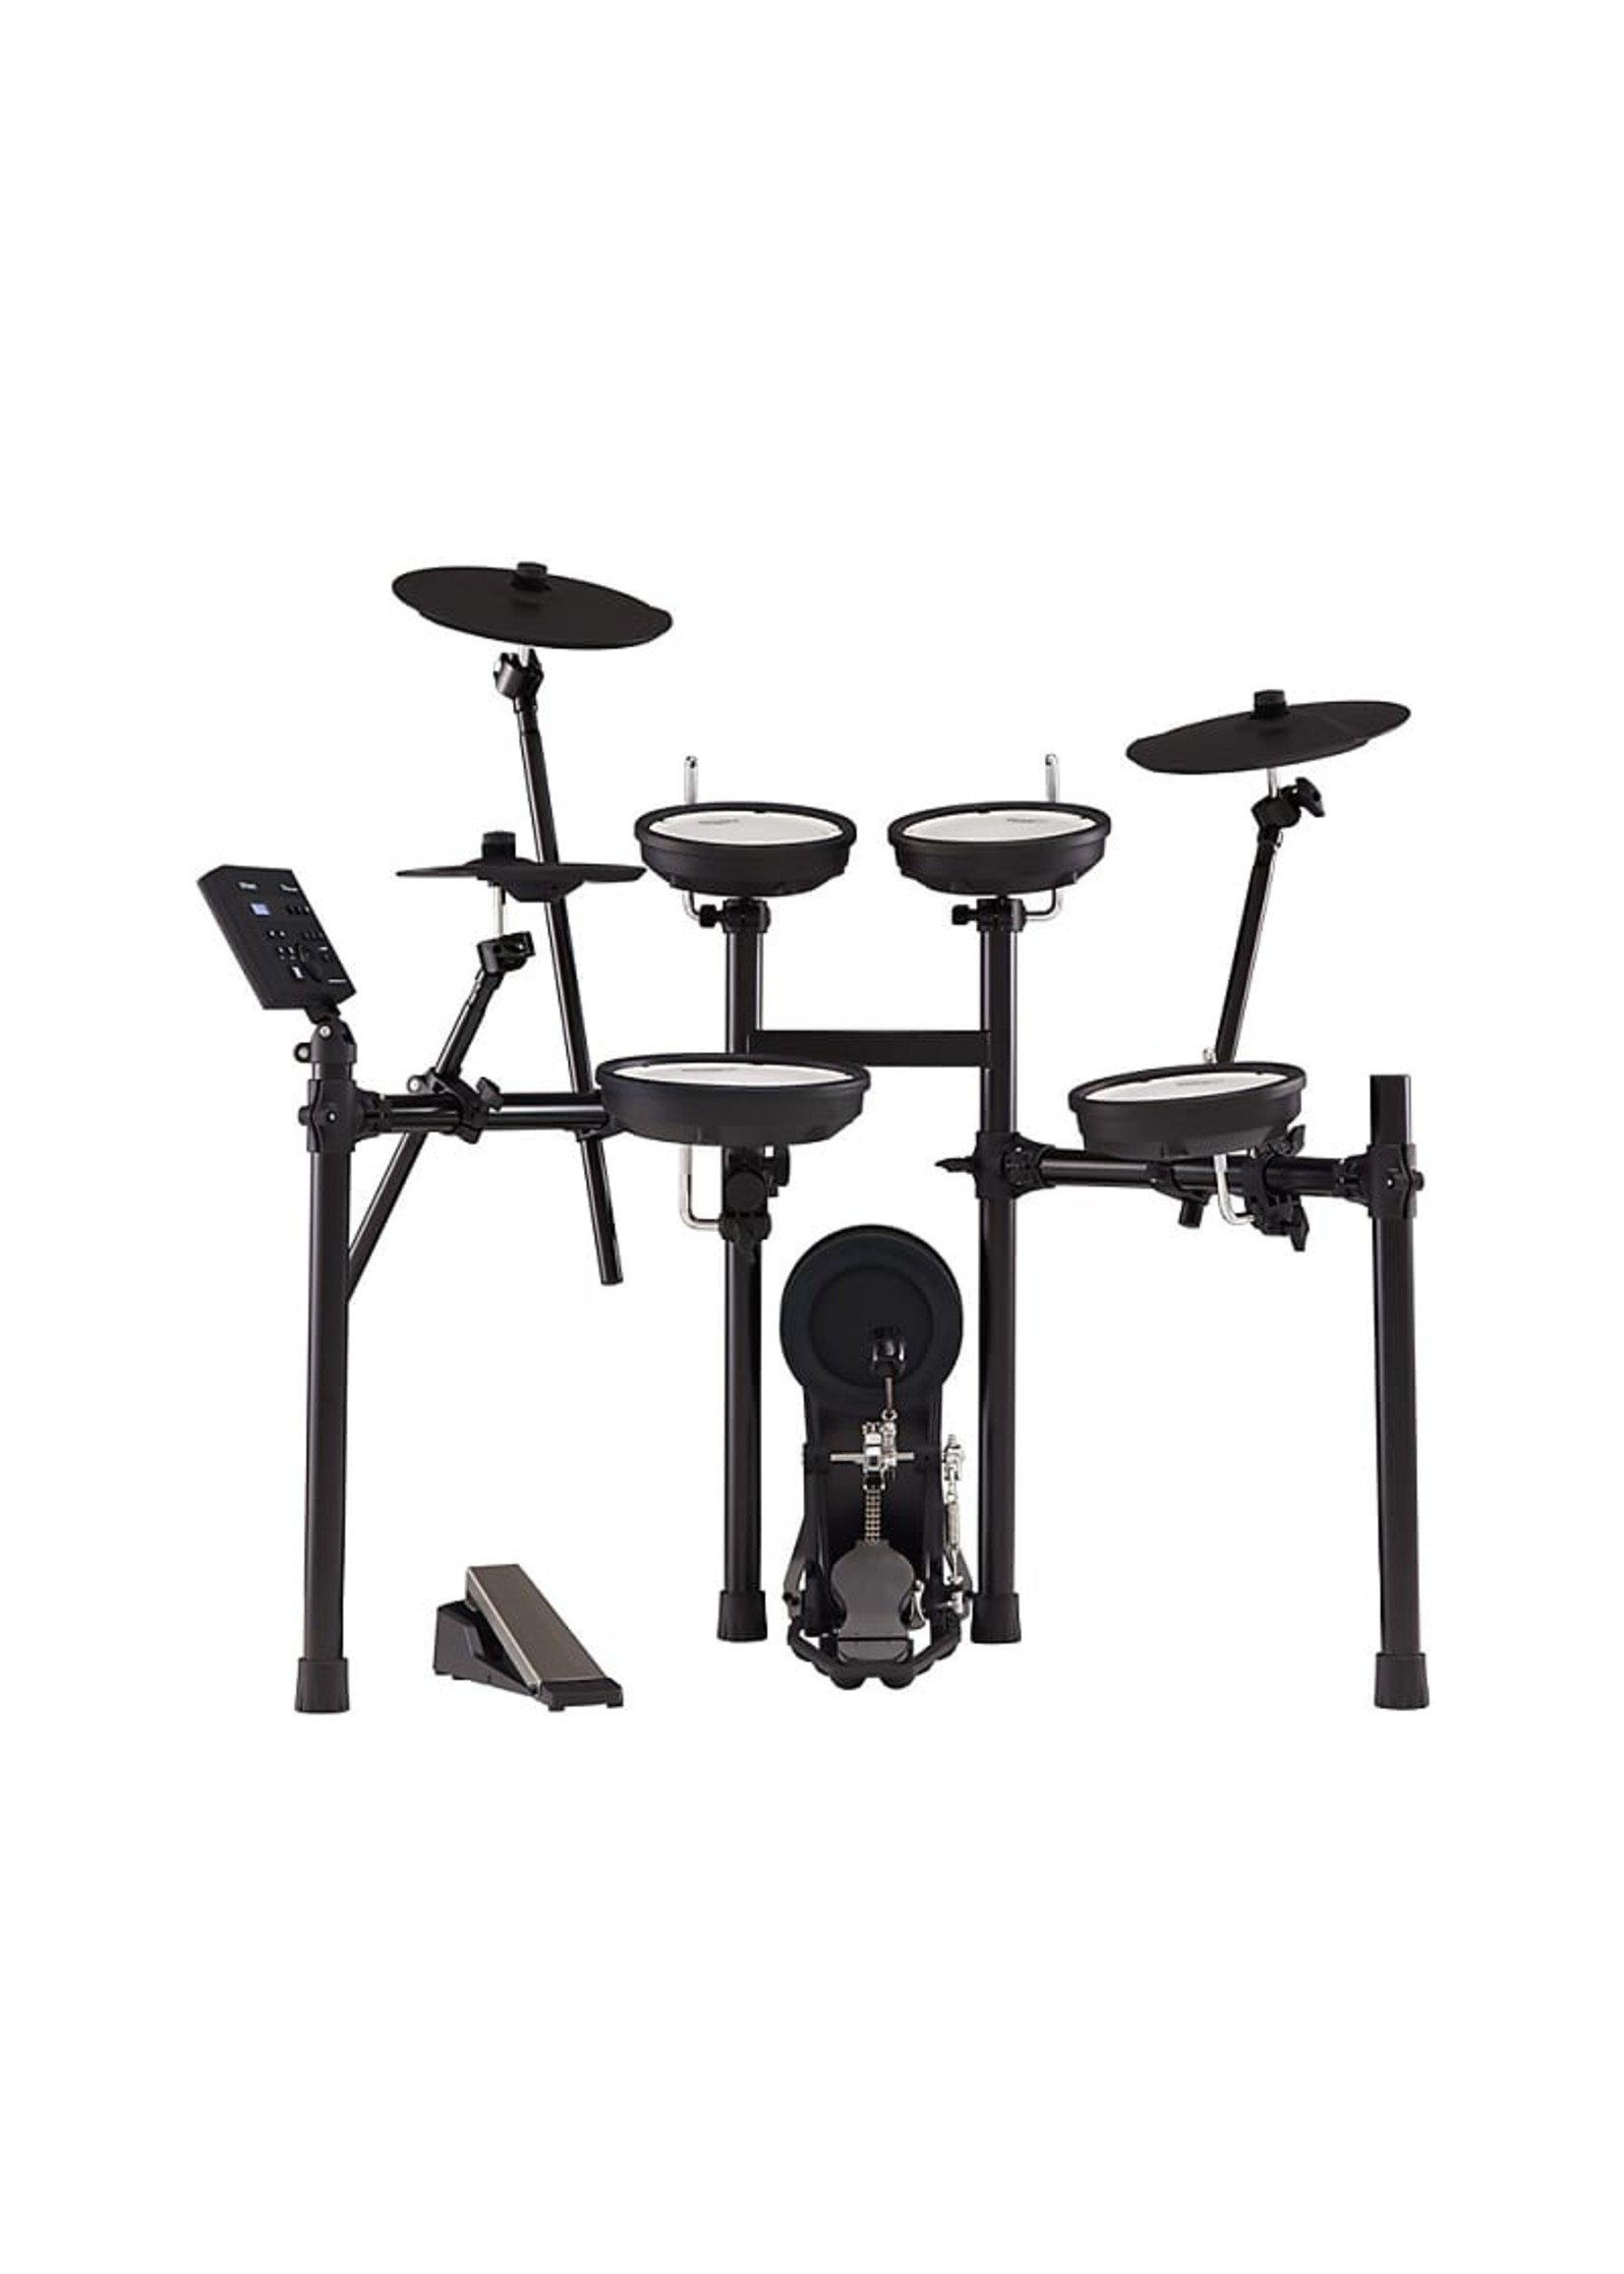 Roland Roland TD-07KV Electronic Drum Kit